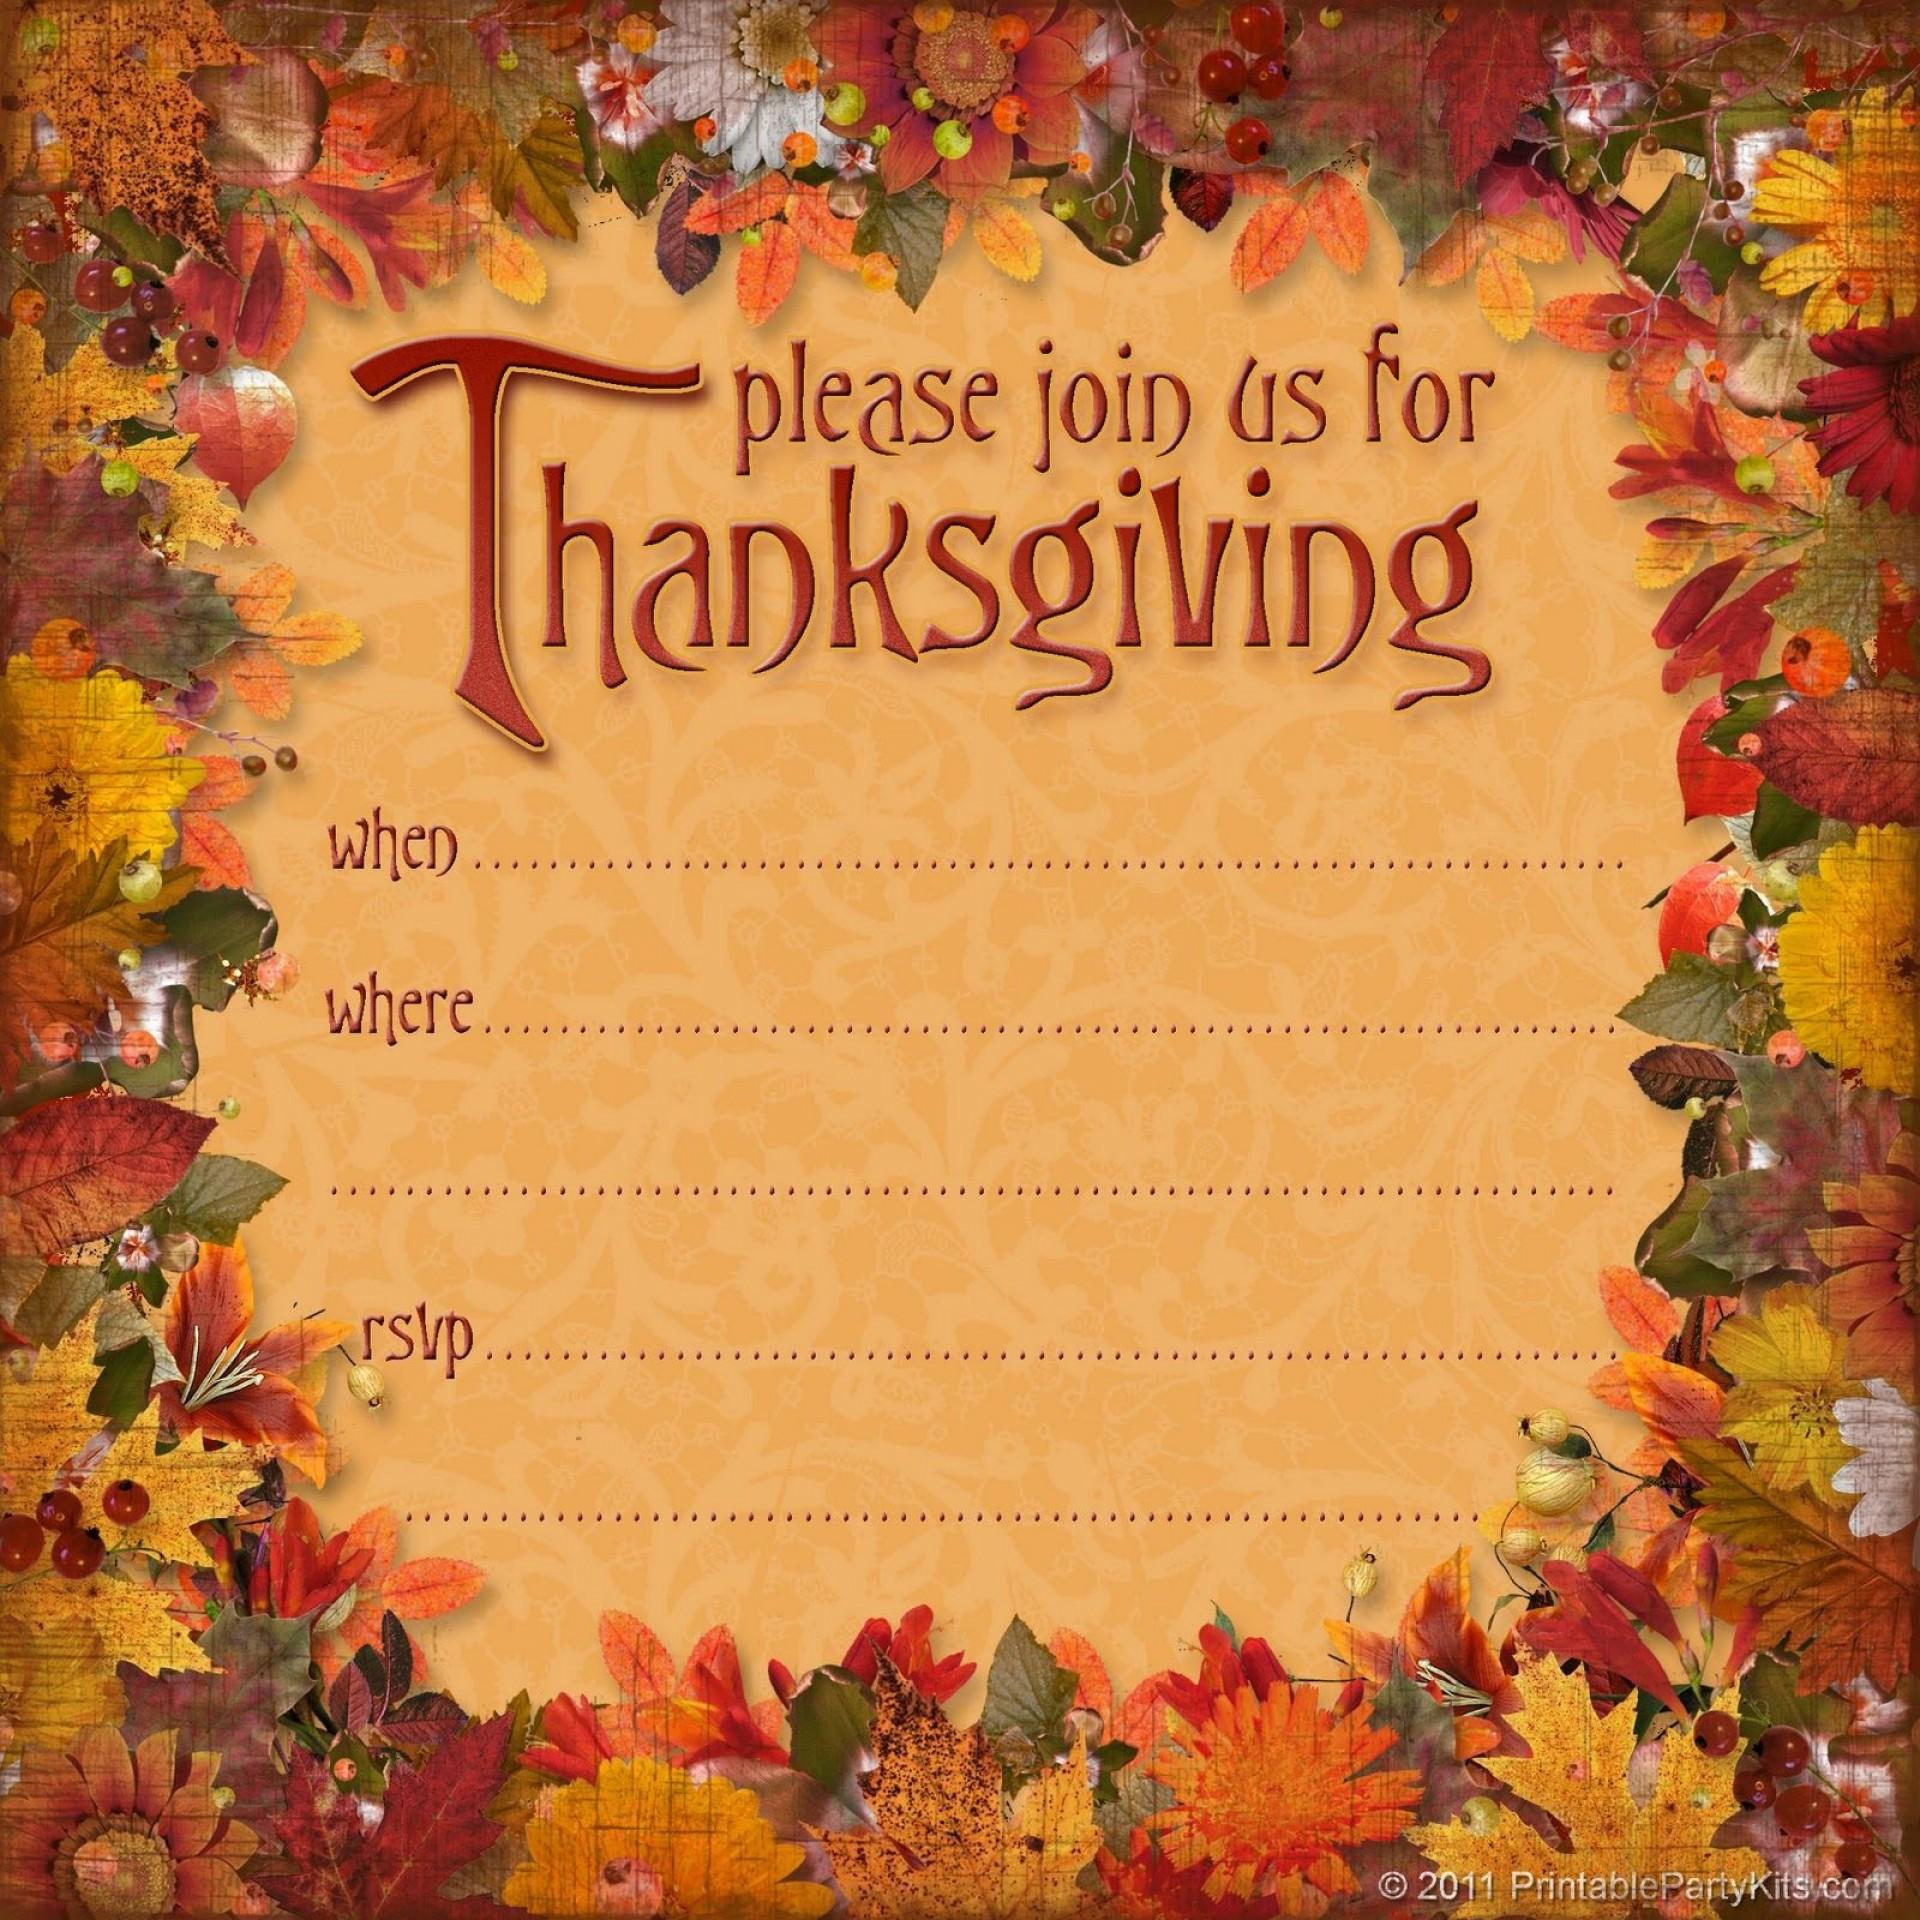 000 Frightening Free Thanksgiving Invitation Template Idea  Templates Printable Dinner Download Potluck1920